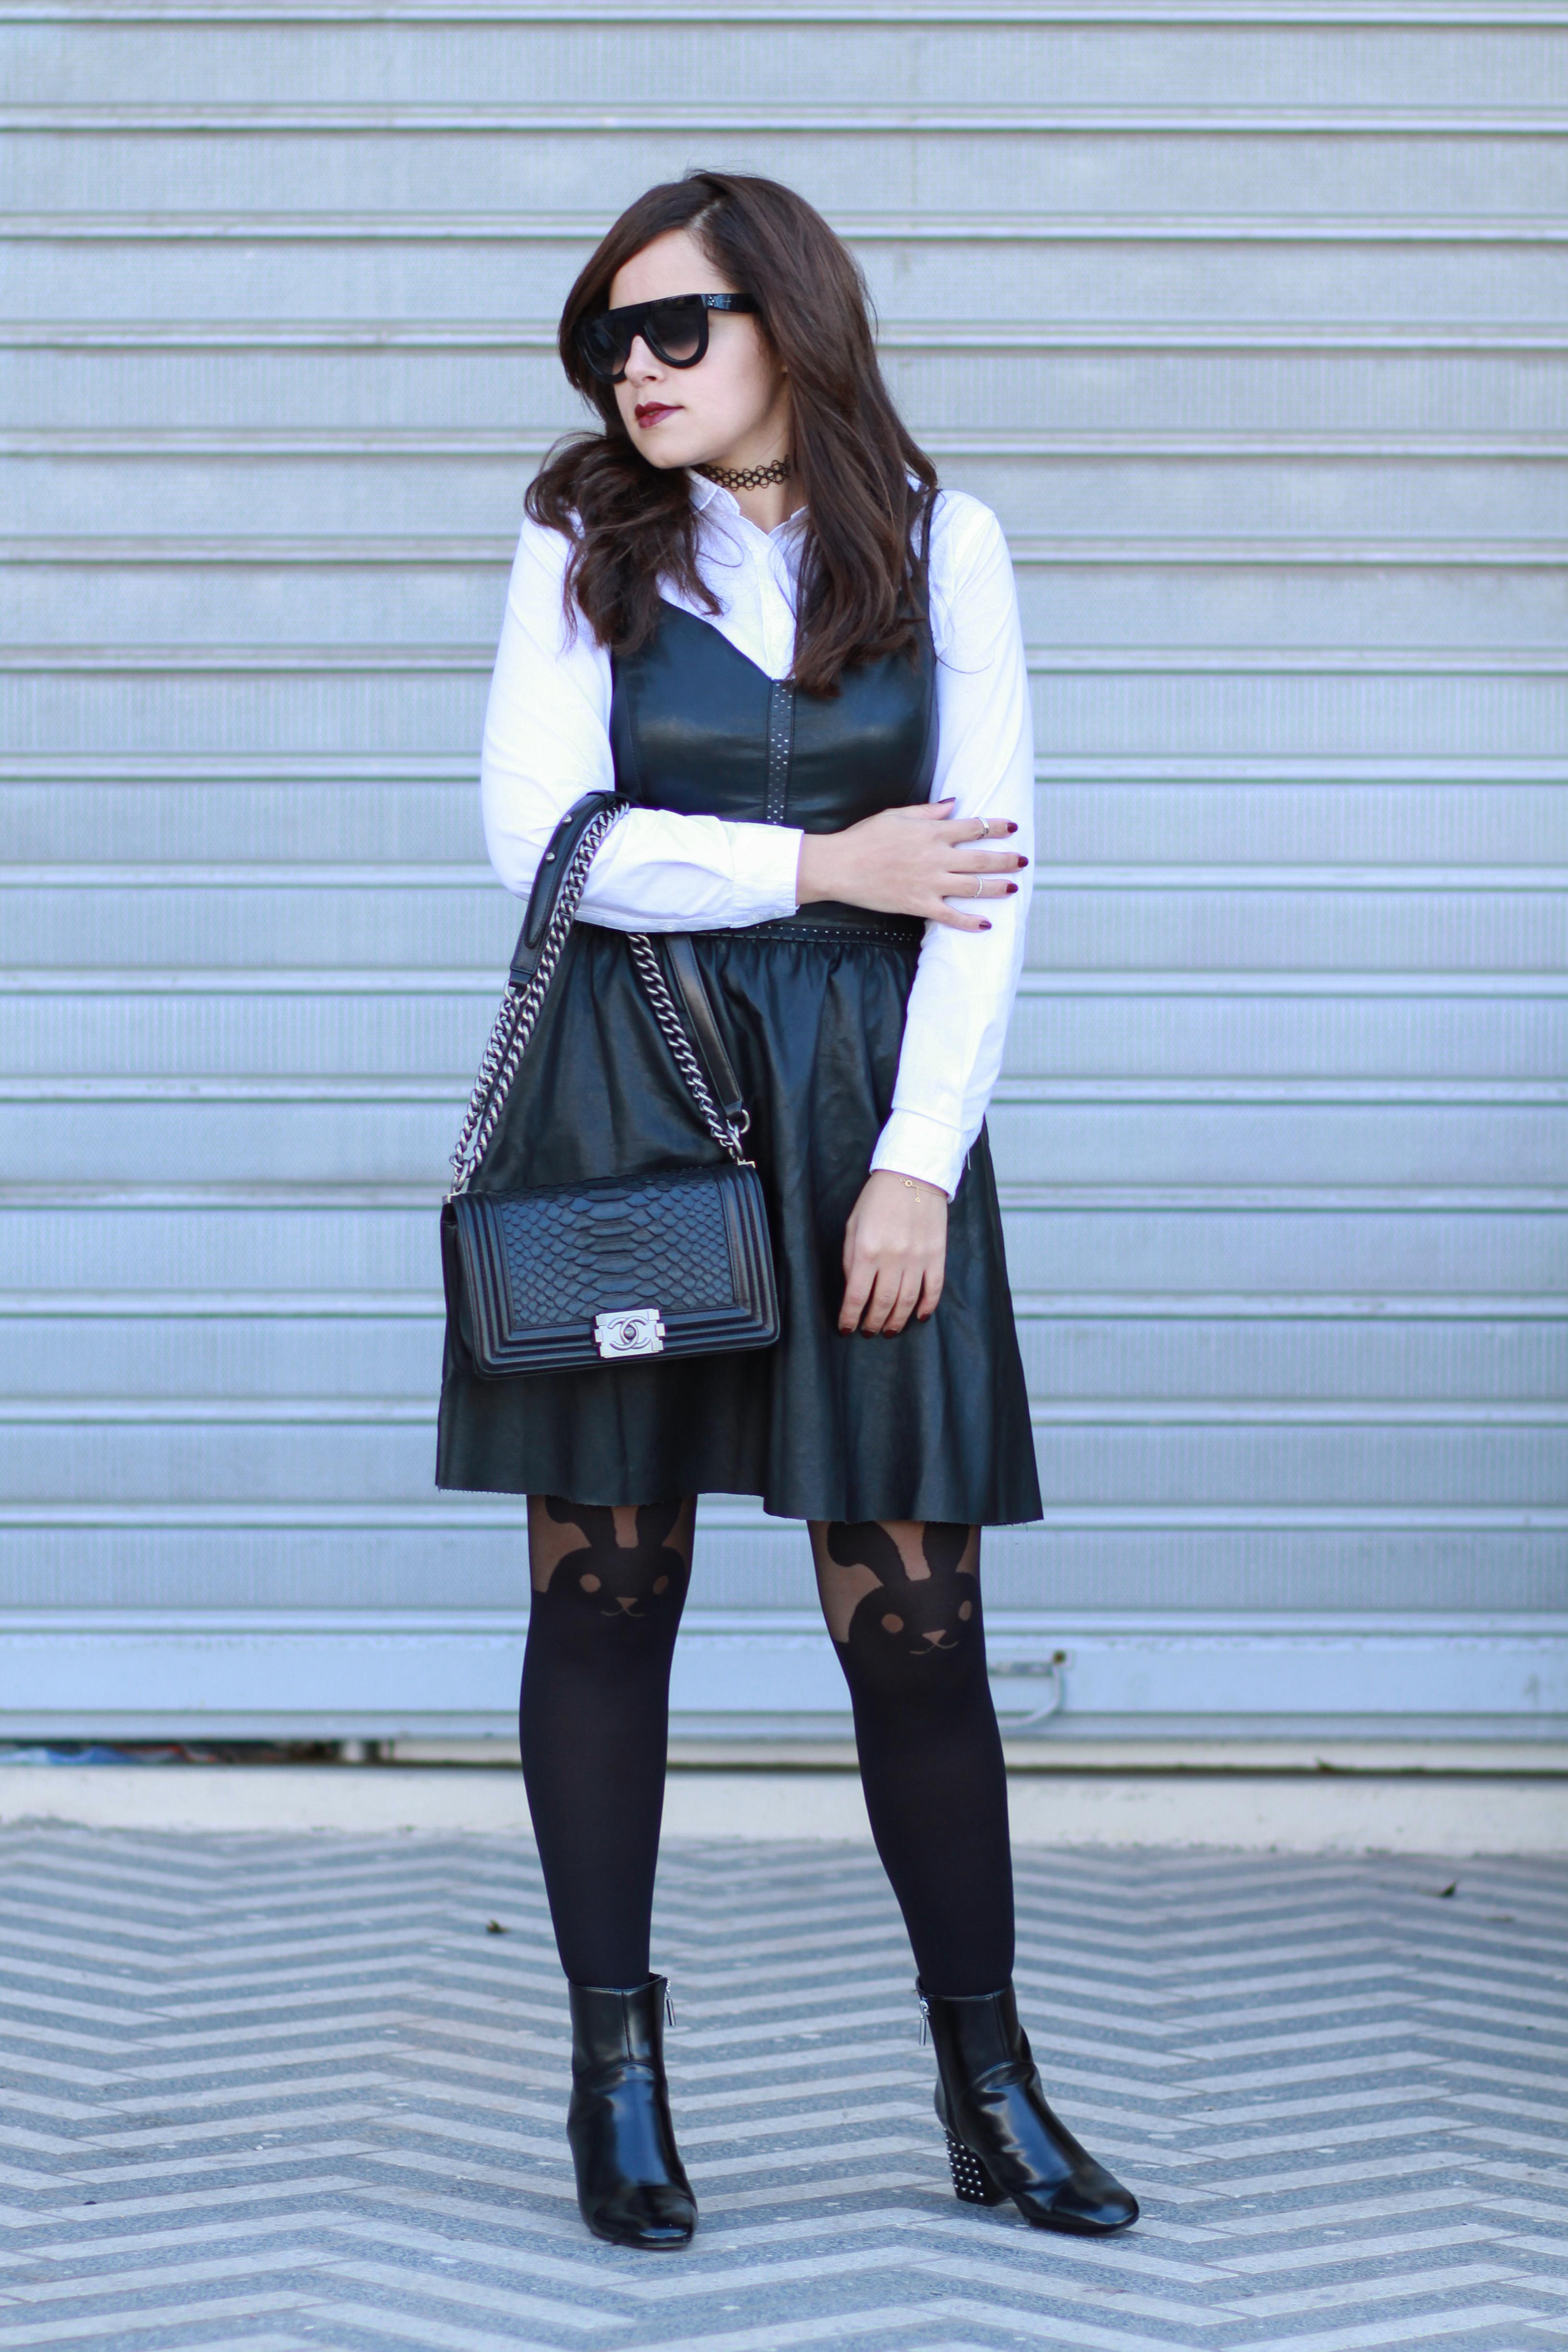 fake-leather-dress-blog-mode-chiccarpediem-